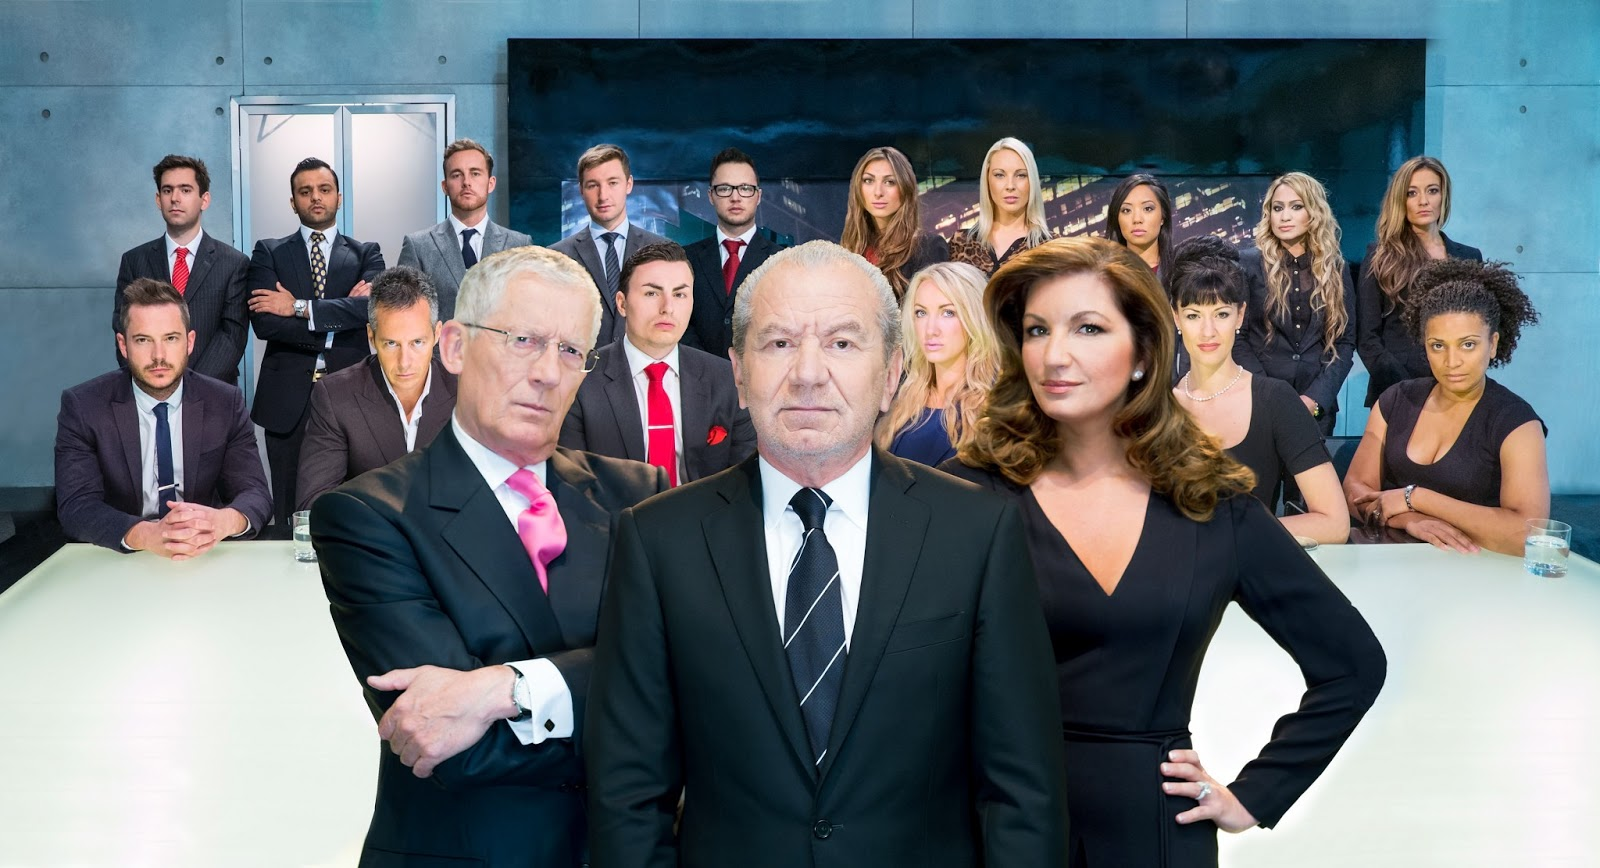 bbc apprentice 2013 meet the candidates 2016